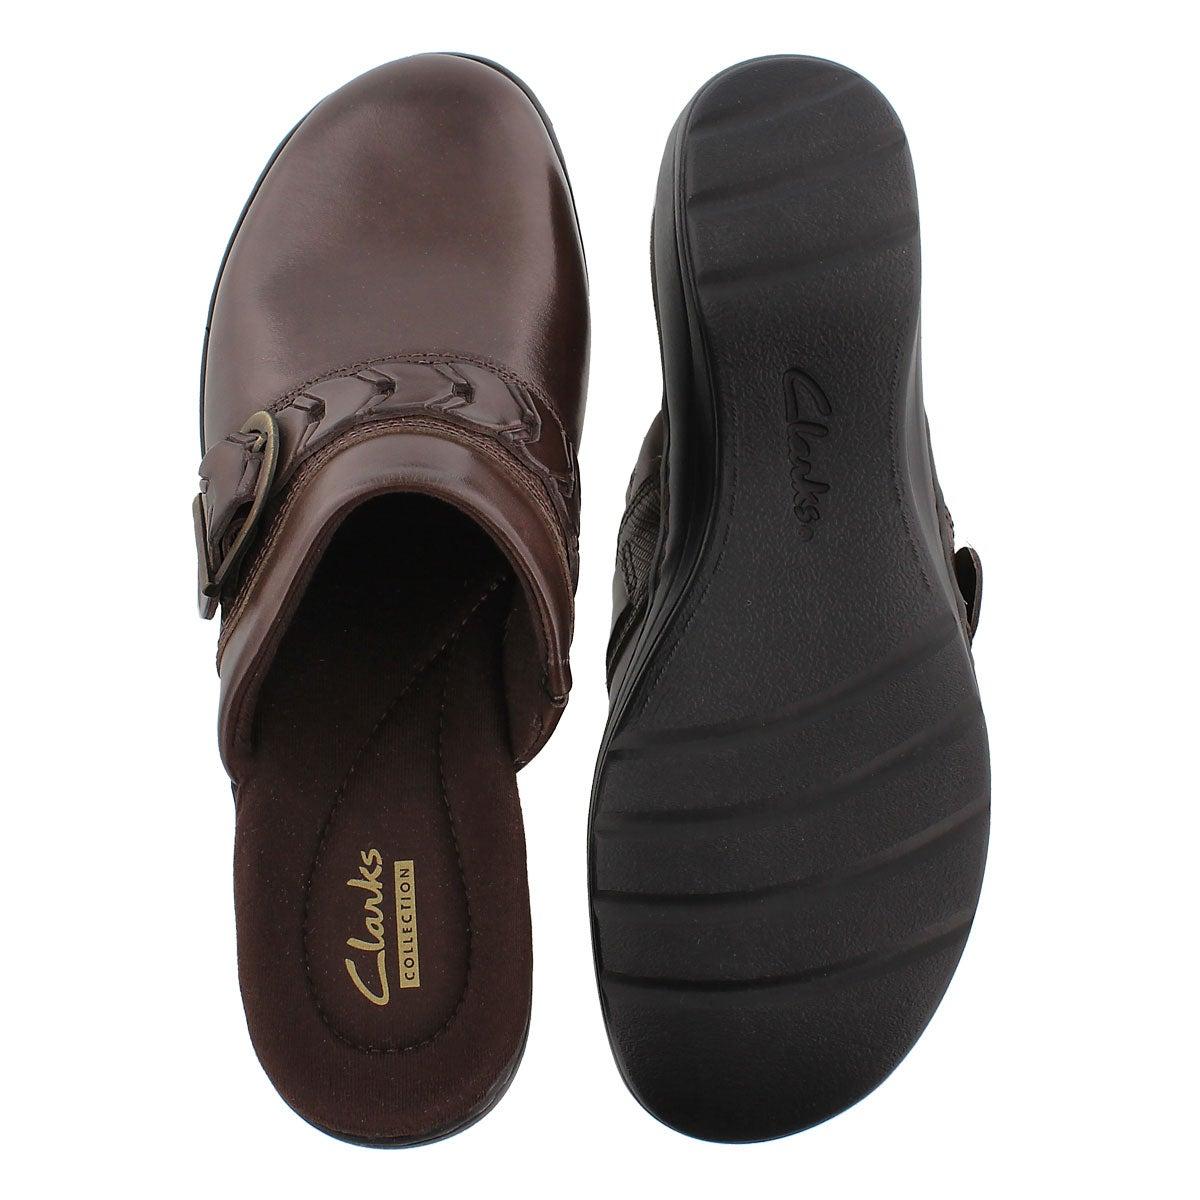 Lds Hayla Titan brn leather casual clog